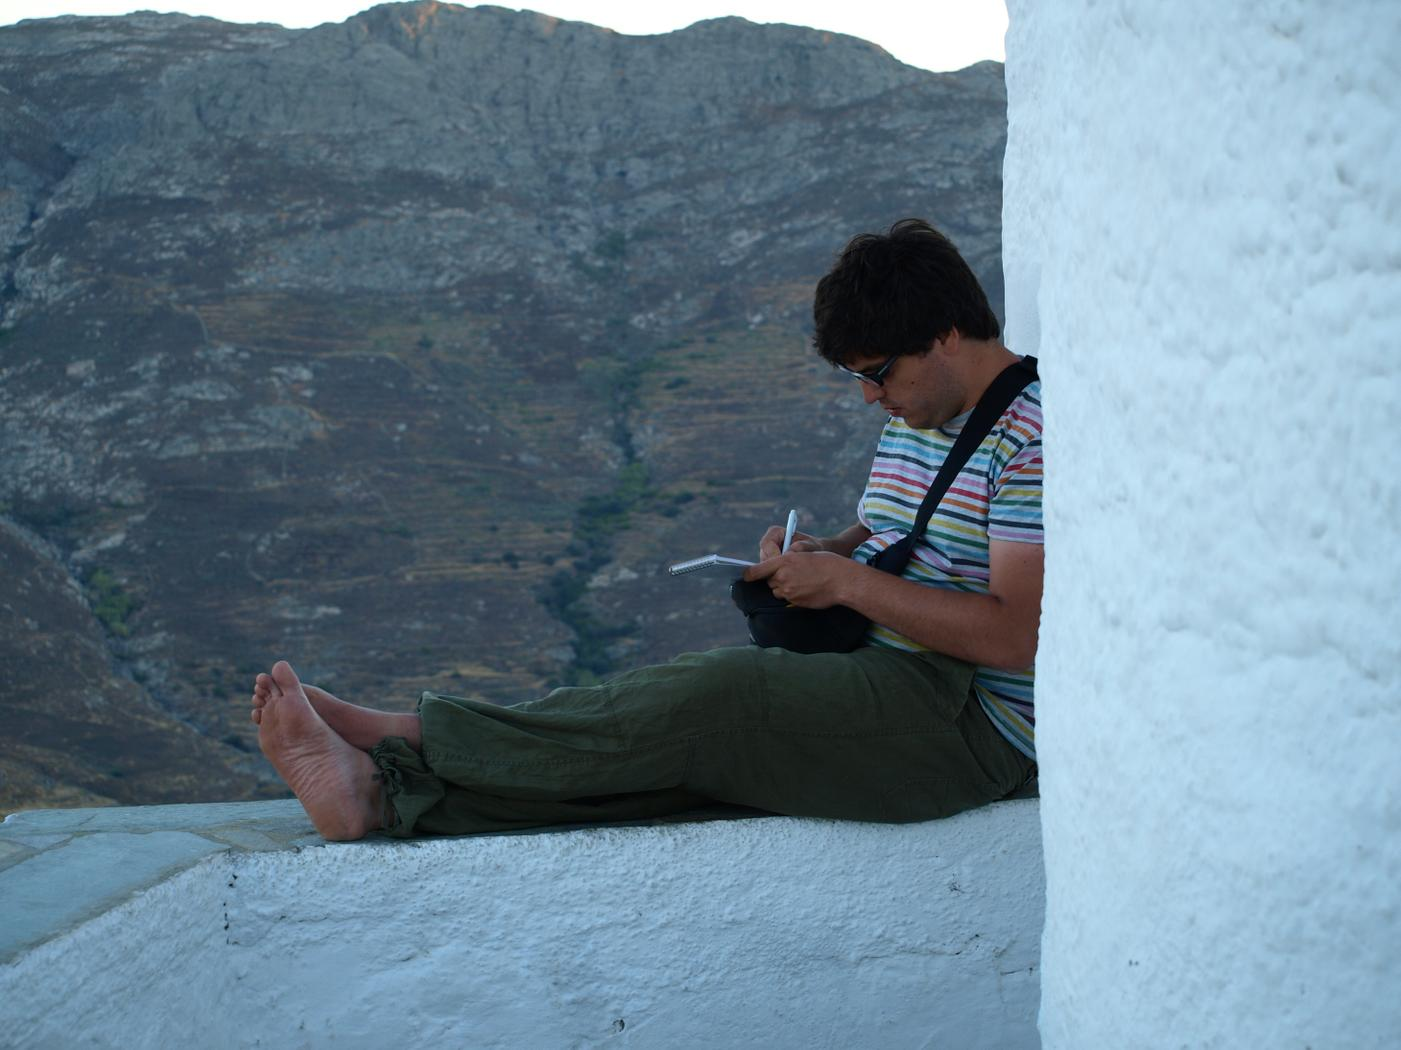 Iker Armentia